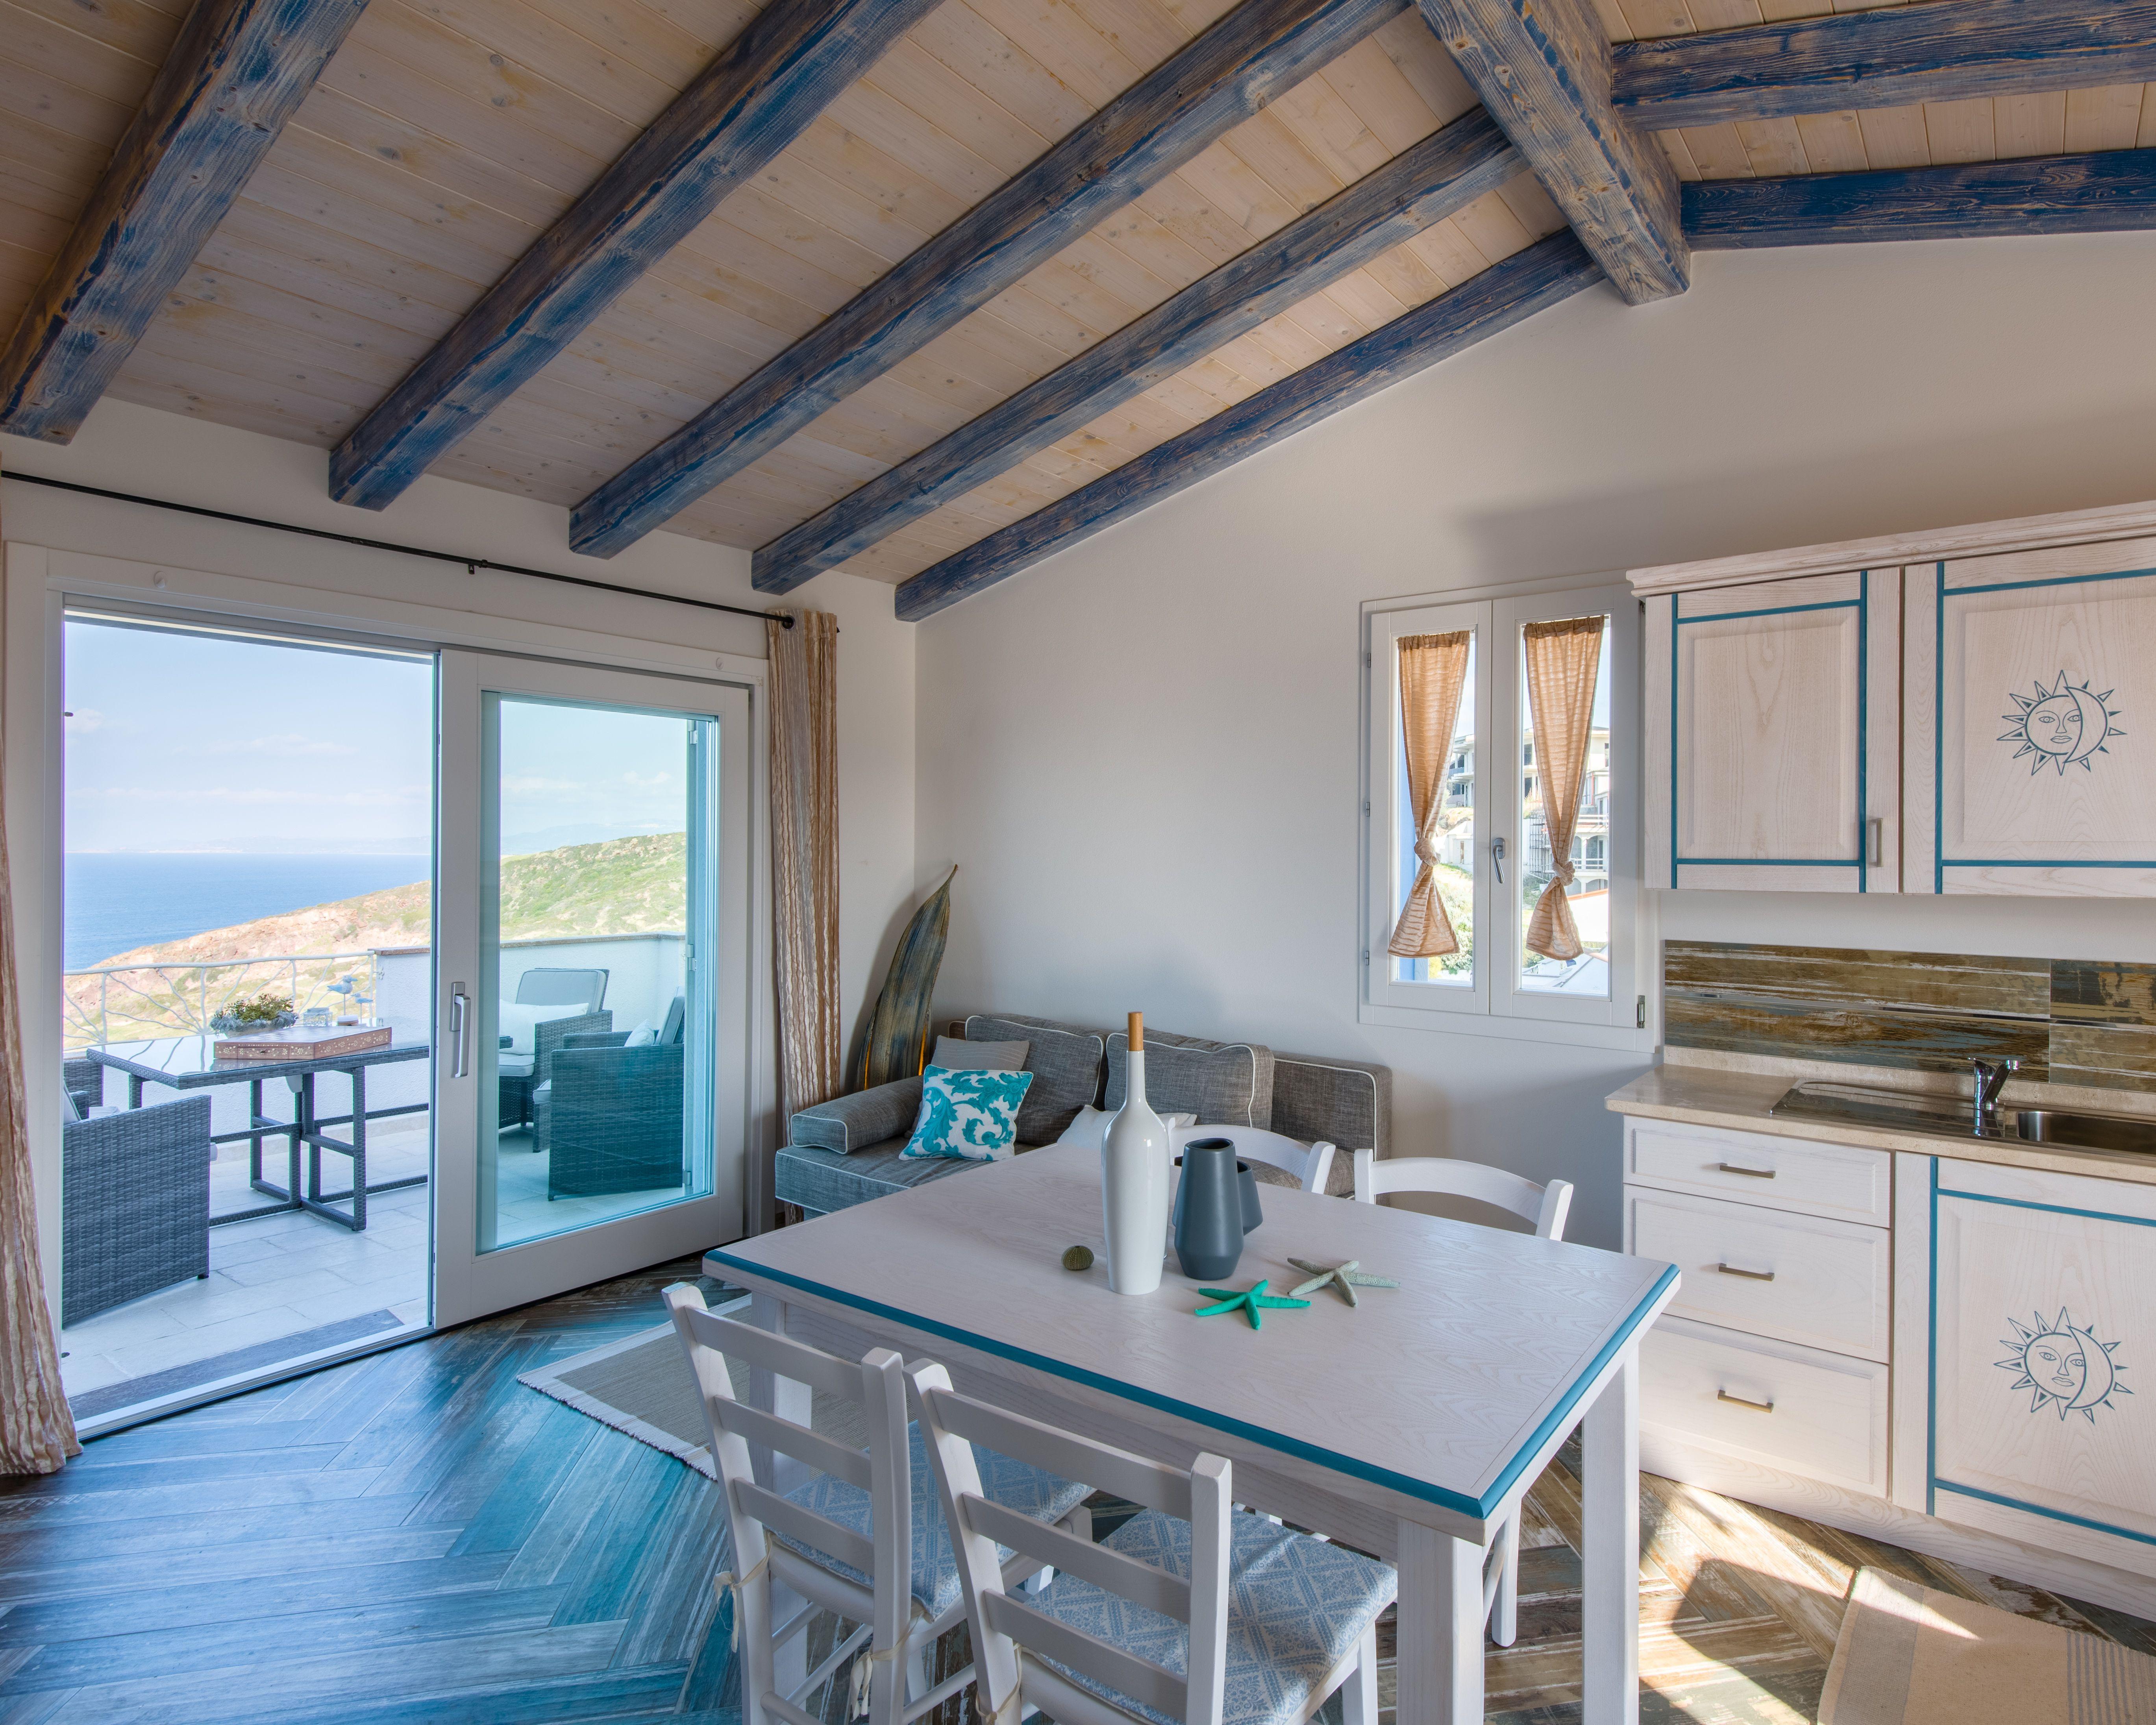 Sardegna Castelsardo arredamenti di stile nel 2019